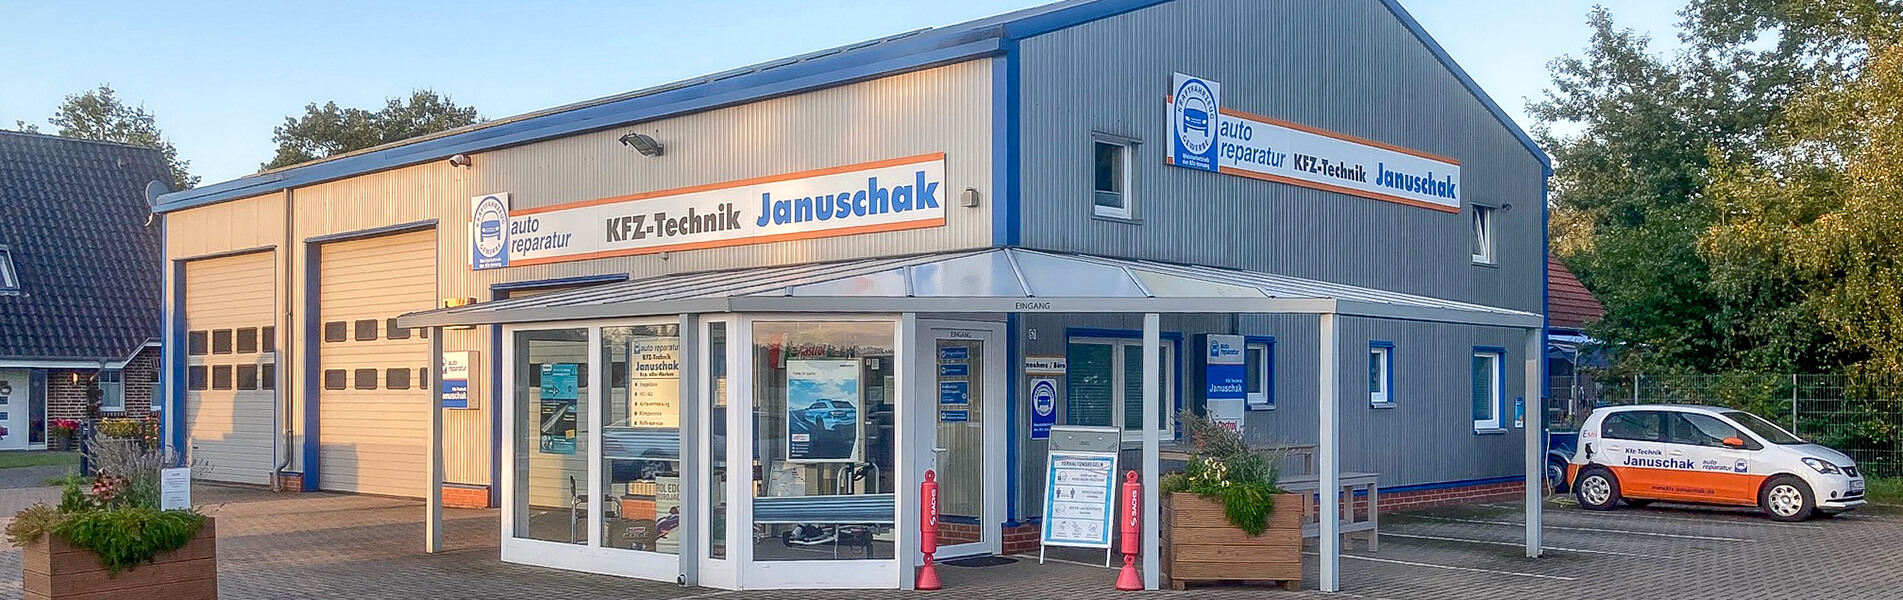 Kfz-Werkstatt Januschak Aussenaufnahme